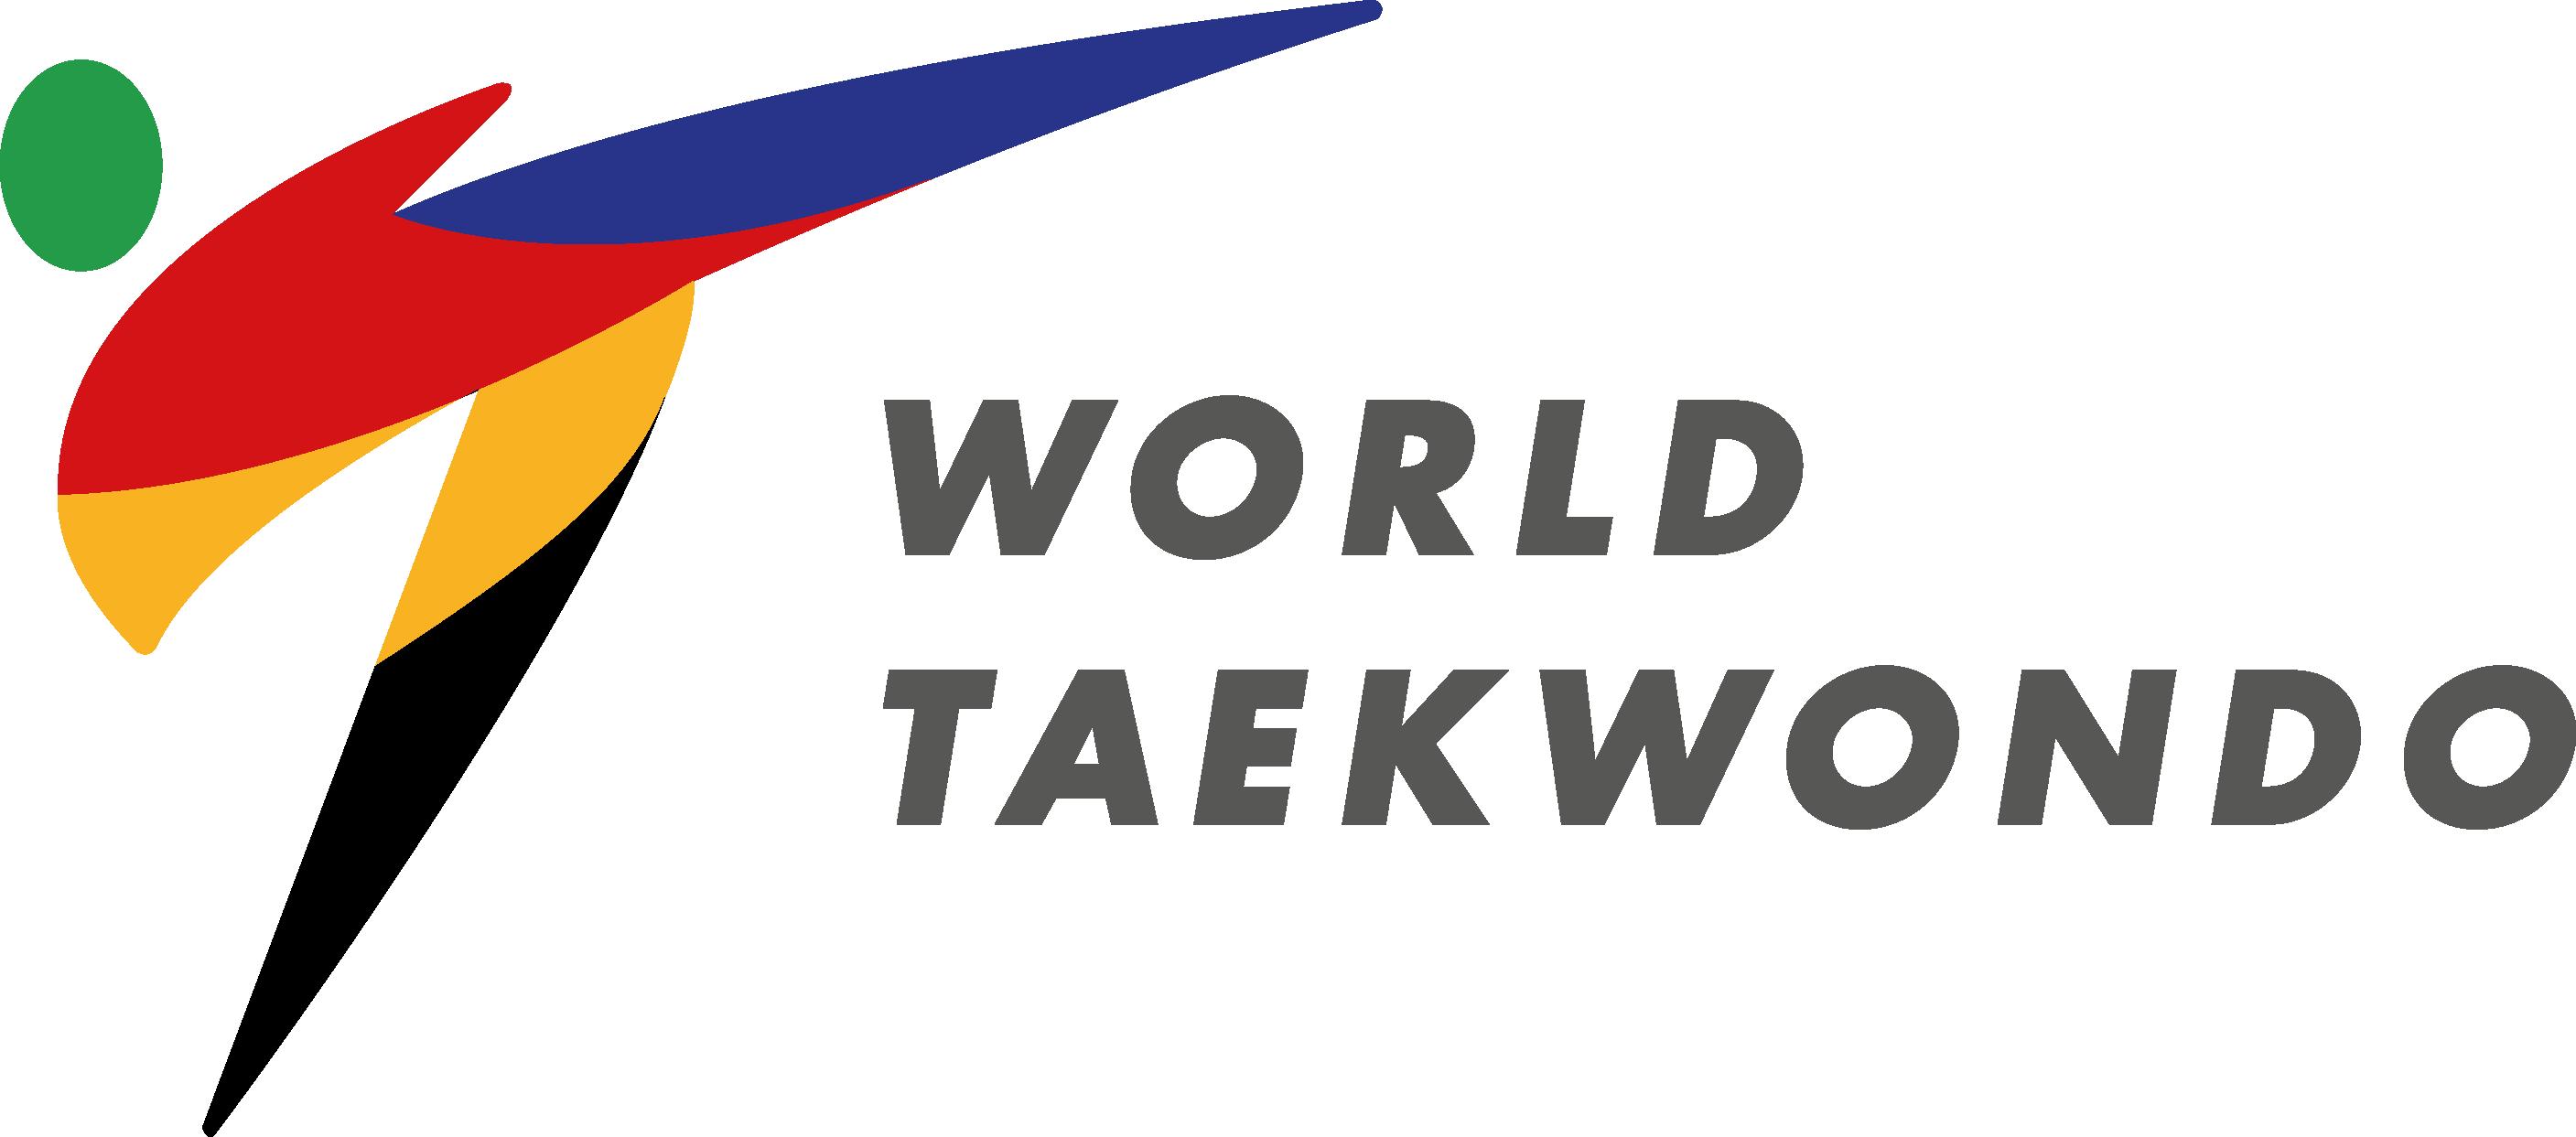 World Taekwondo Federation (WTF) Logo [wtf.org] Vector Icon Template.